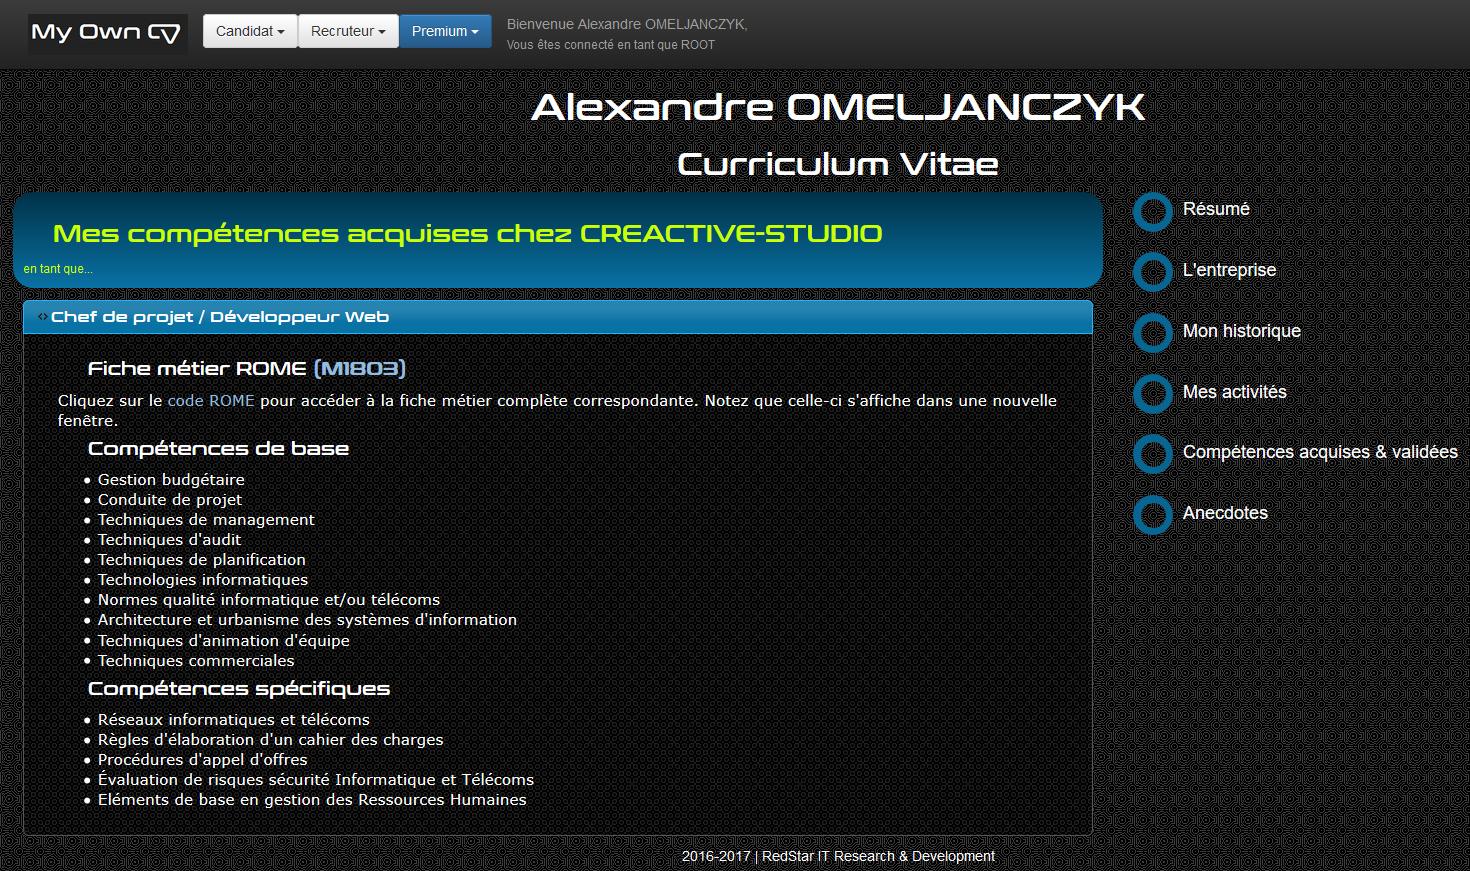 My Own CV #7